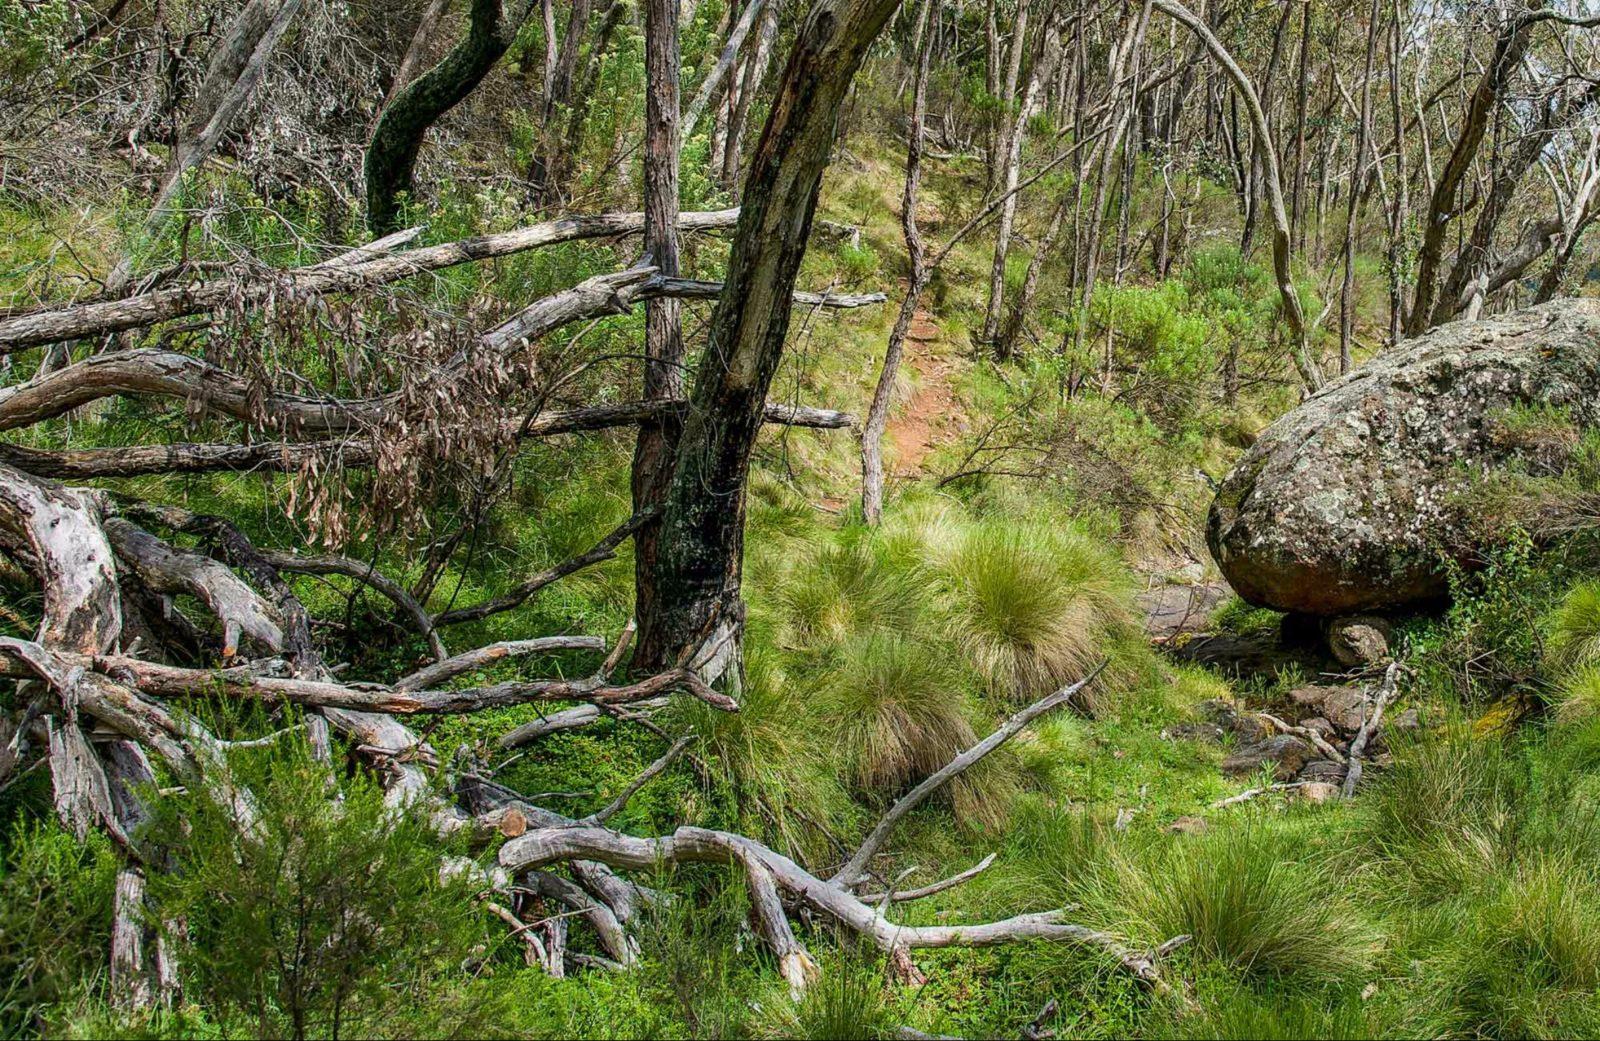 Hopetoun Falls walking track, Mount Canobolas State Conservation Area. Photo: Steve Woodhall